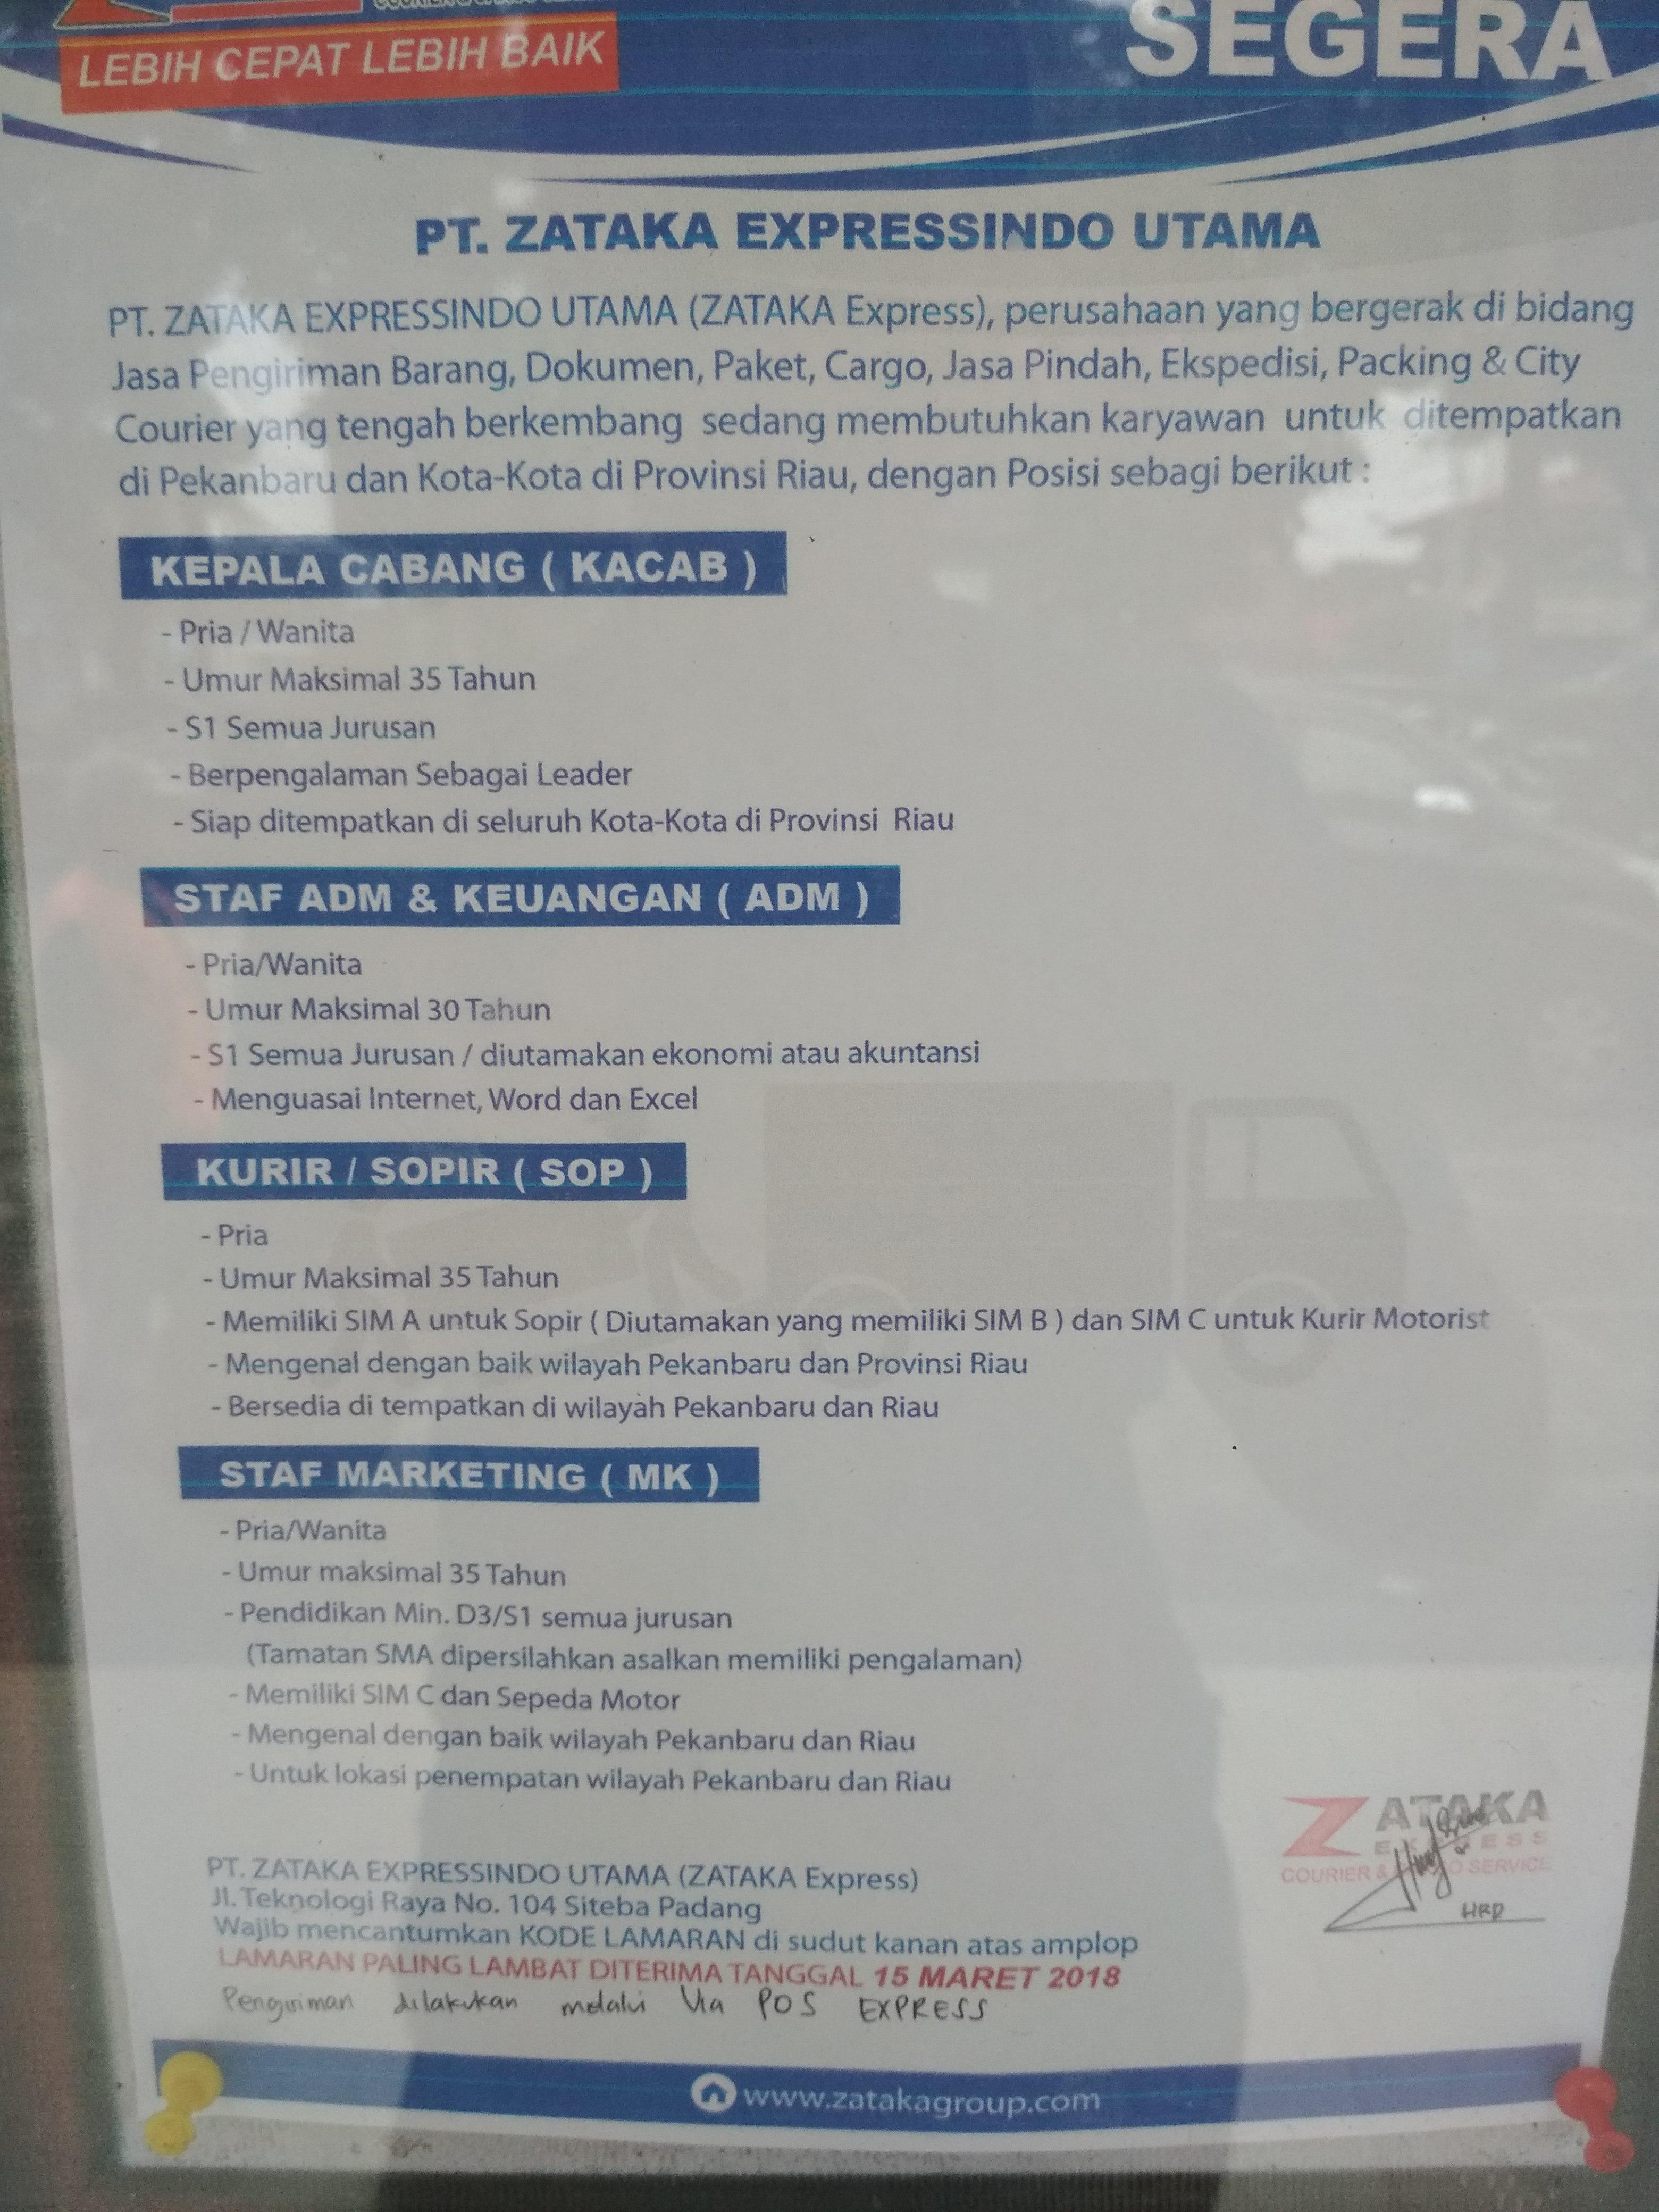 Lowongan Kerja Di PT ZATAKA EXPRESSINDO UTAMA Pekanbaru